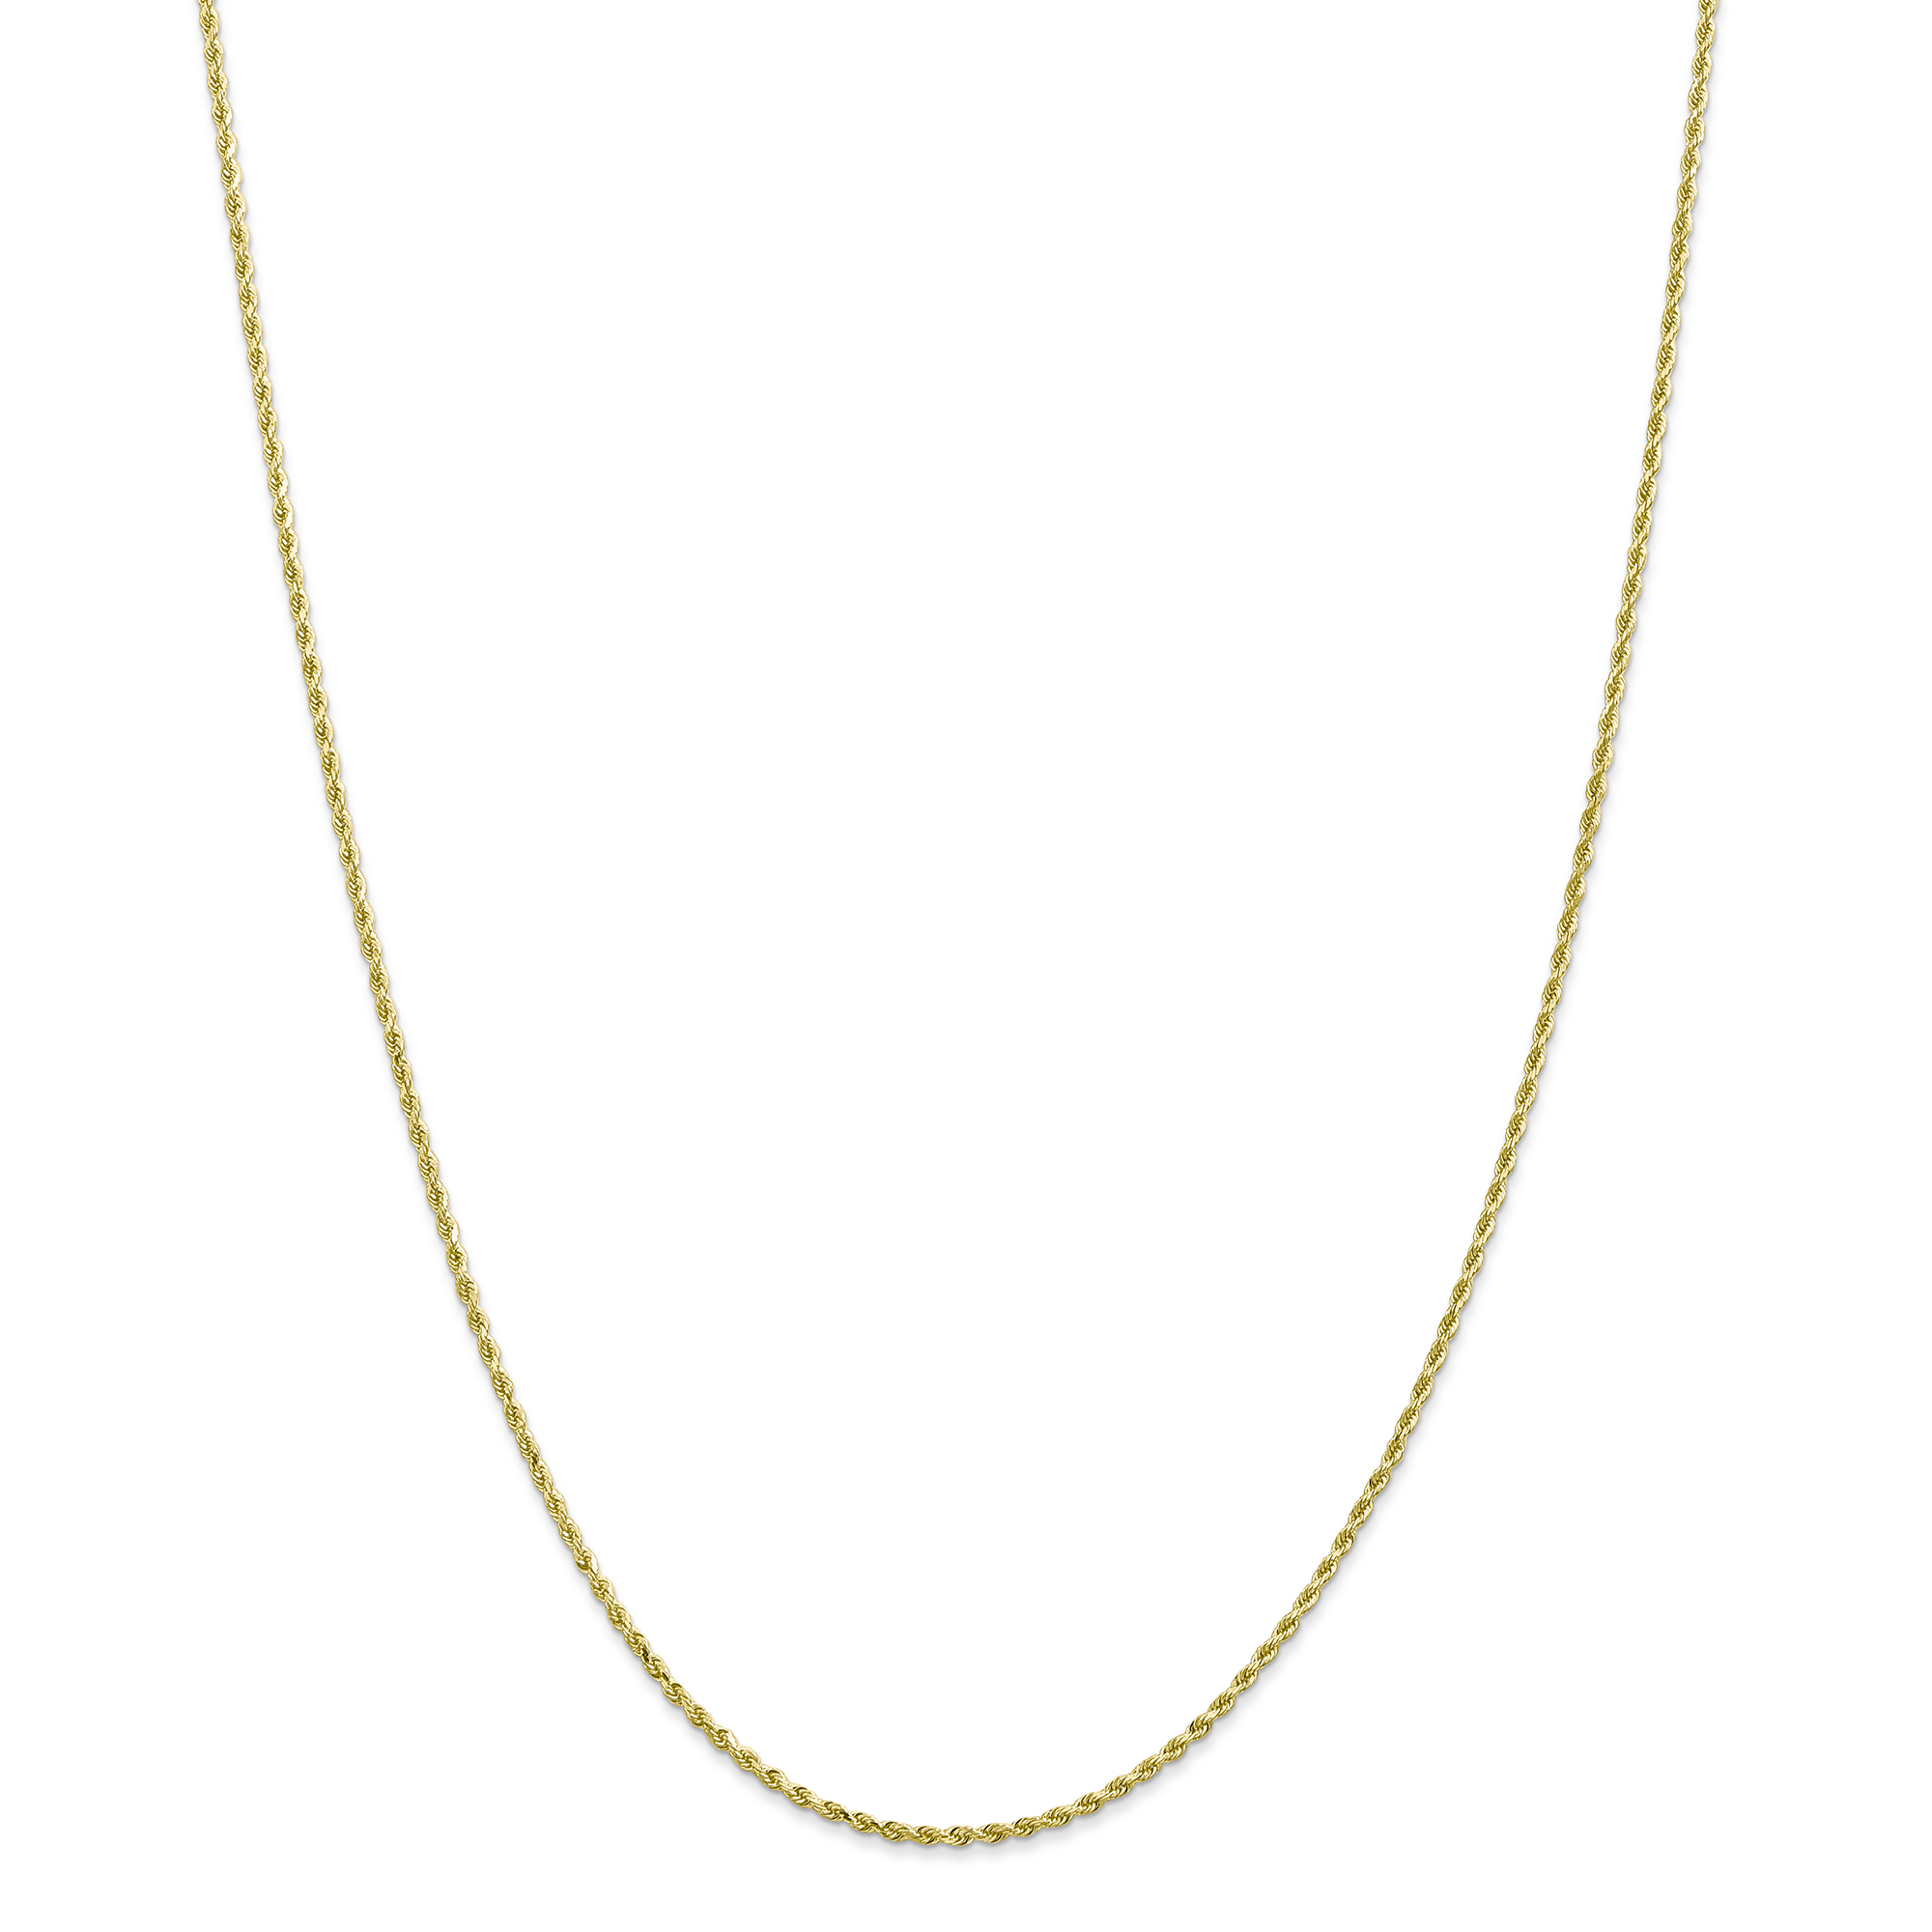 10K Yellow Gold 1.75mm Handmade Diamond Cut Rope Chain 30 Inch - image 5 de 5